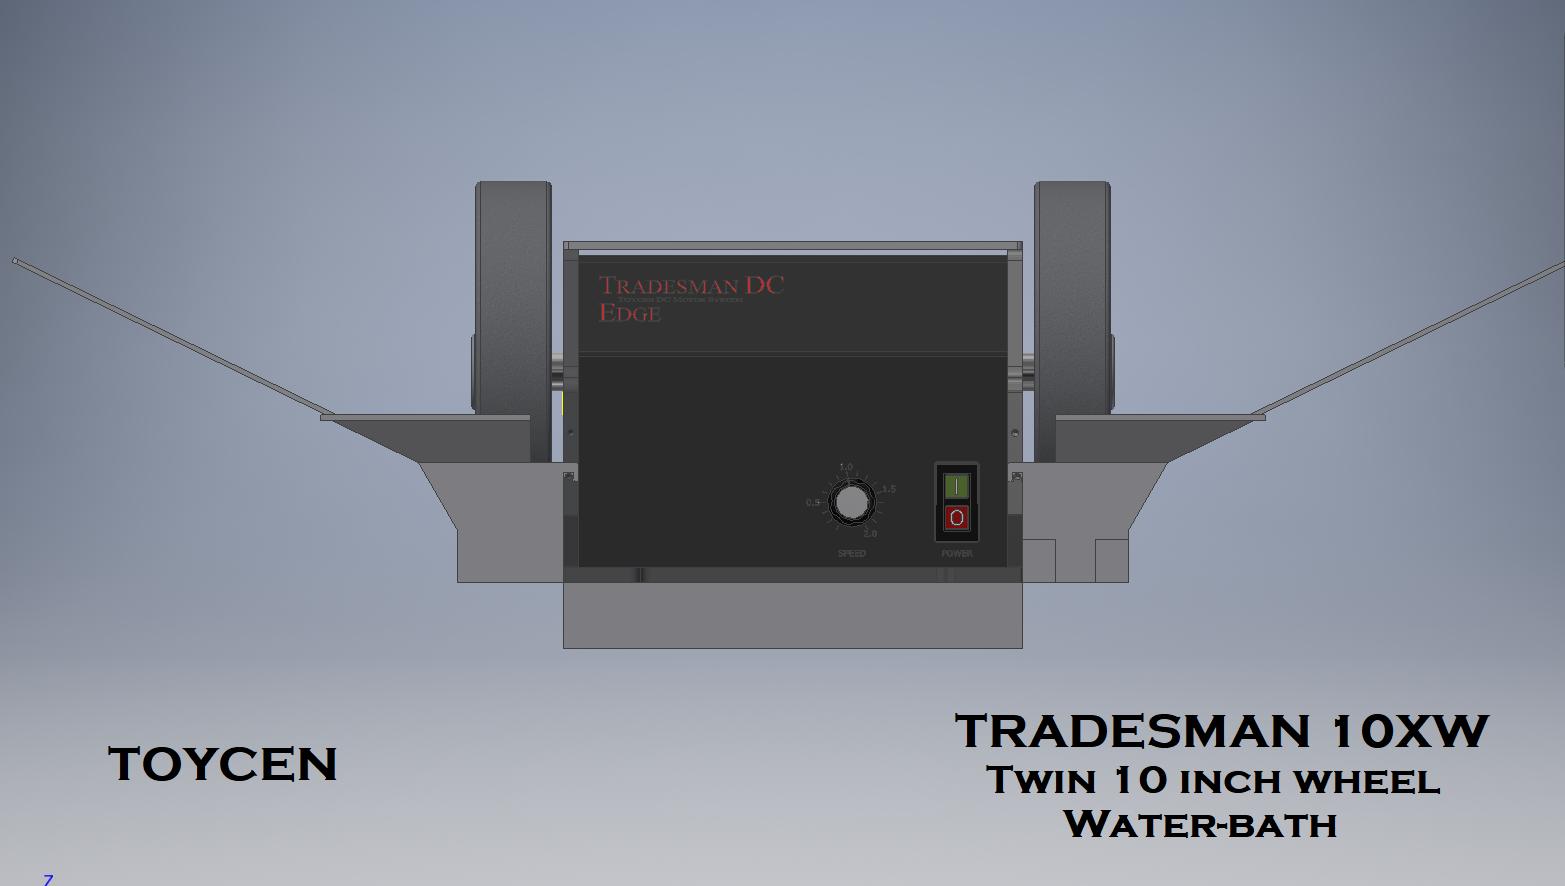 Tradesman x10 Water-bath wheels